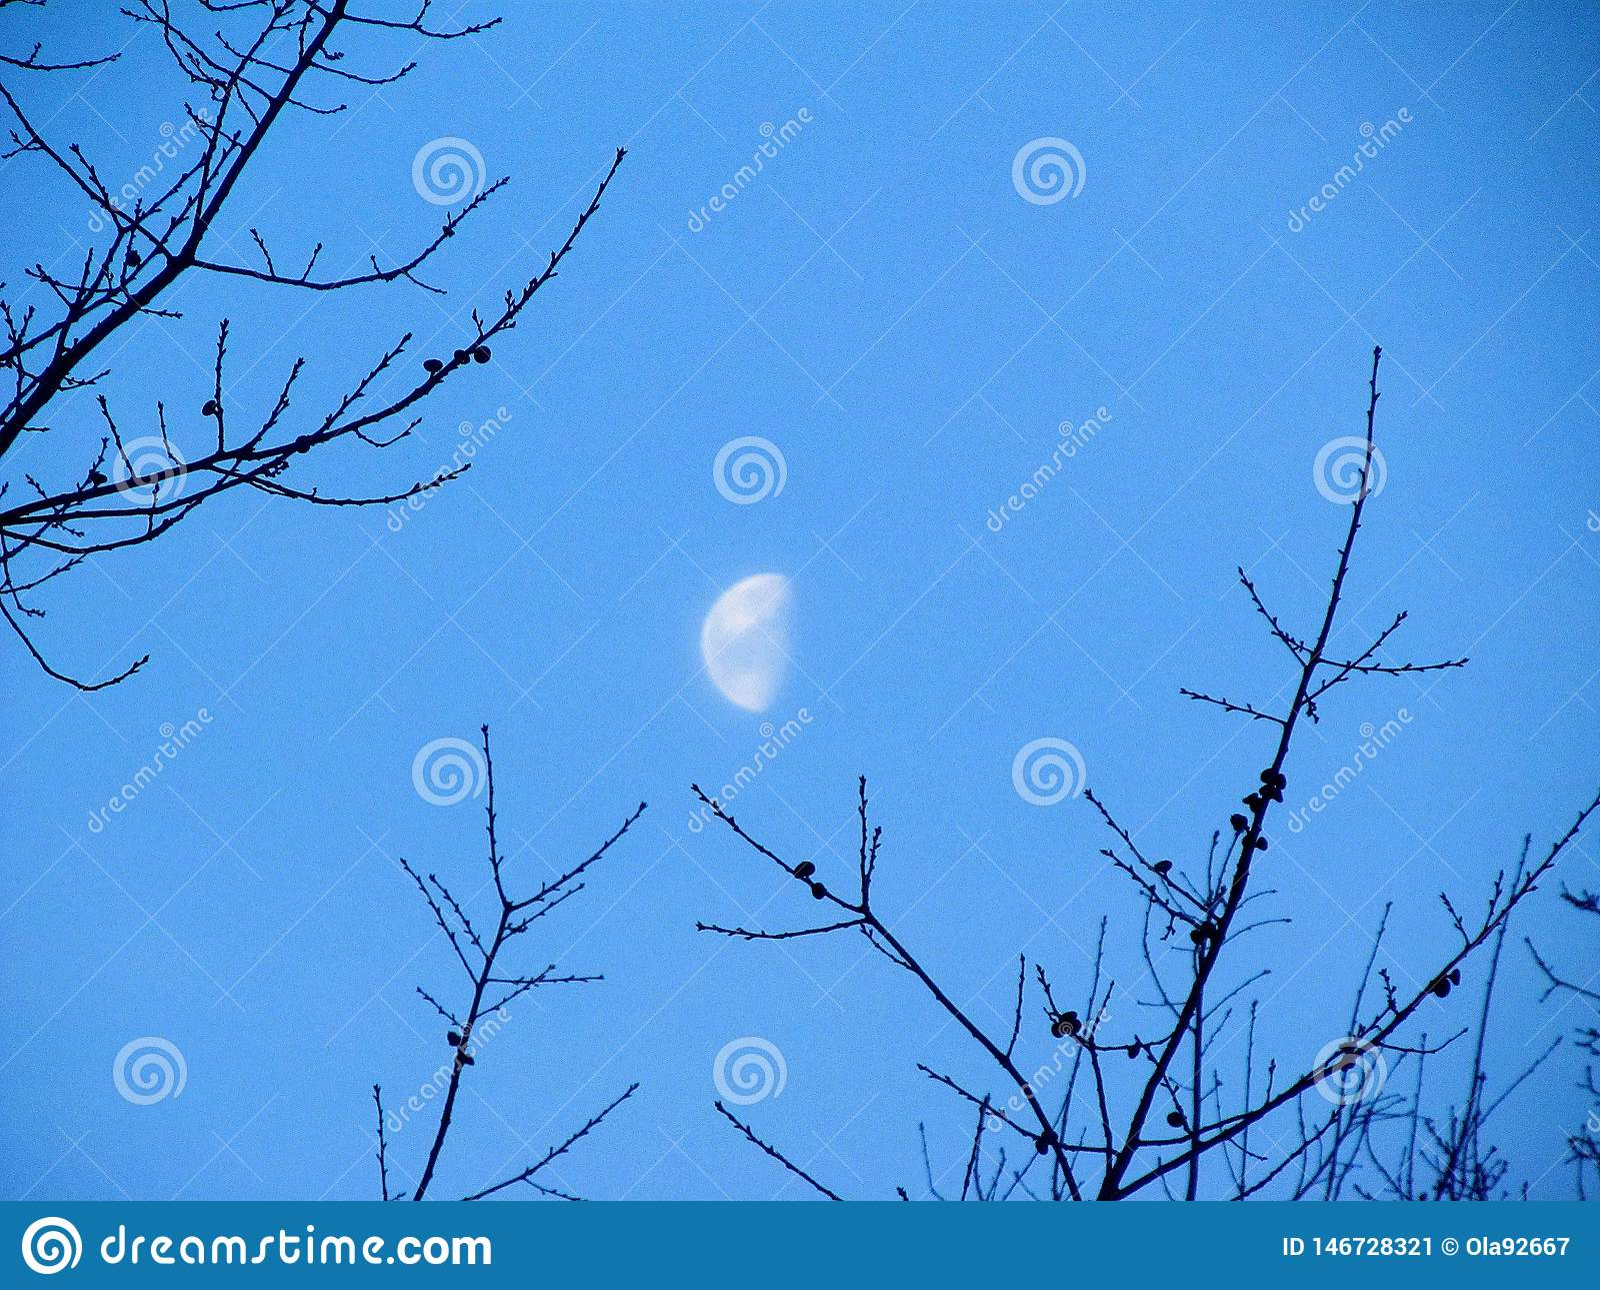 Half of the Moon